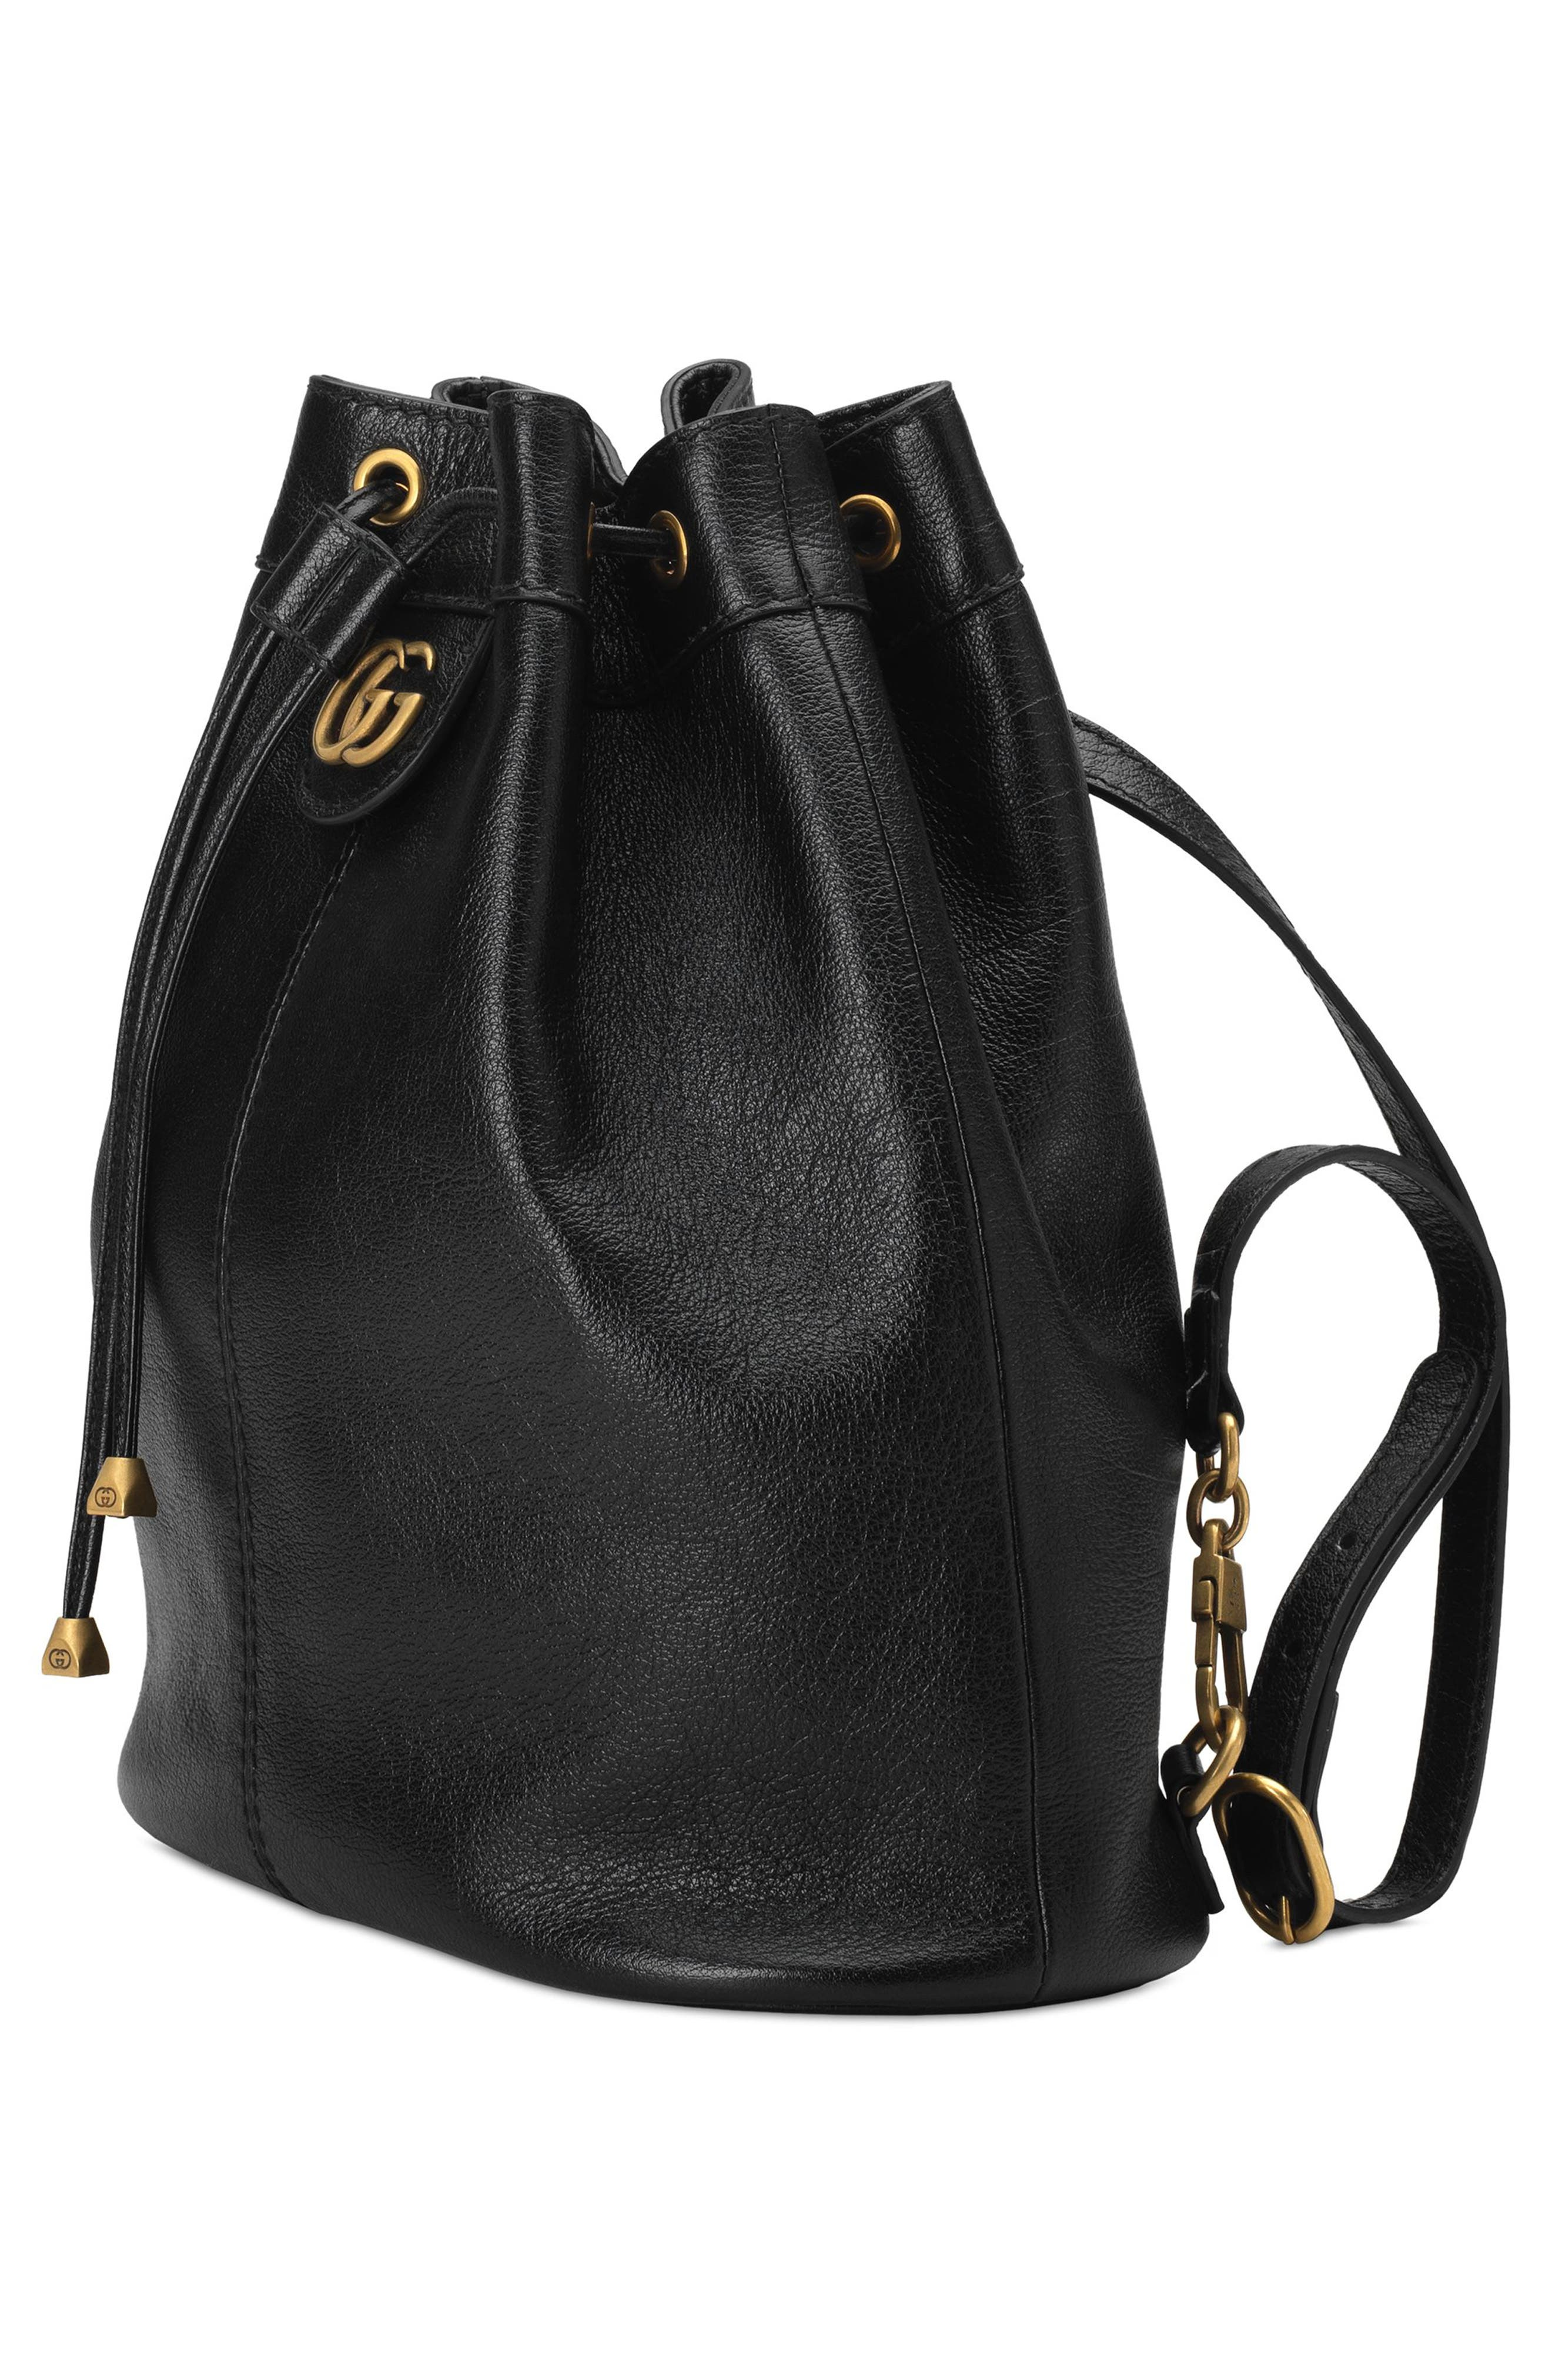 Medium RE(BELLE) Leather Convertible Bucket Bag,                             Alternate thumbnail 4, color,                             001